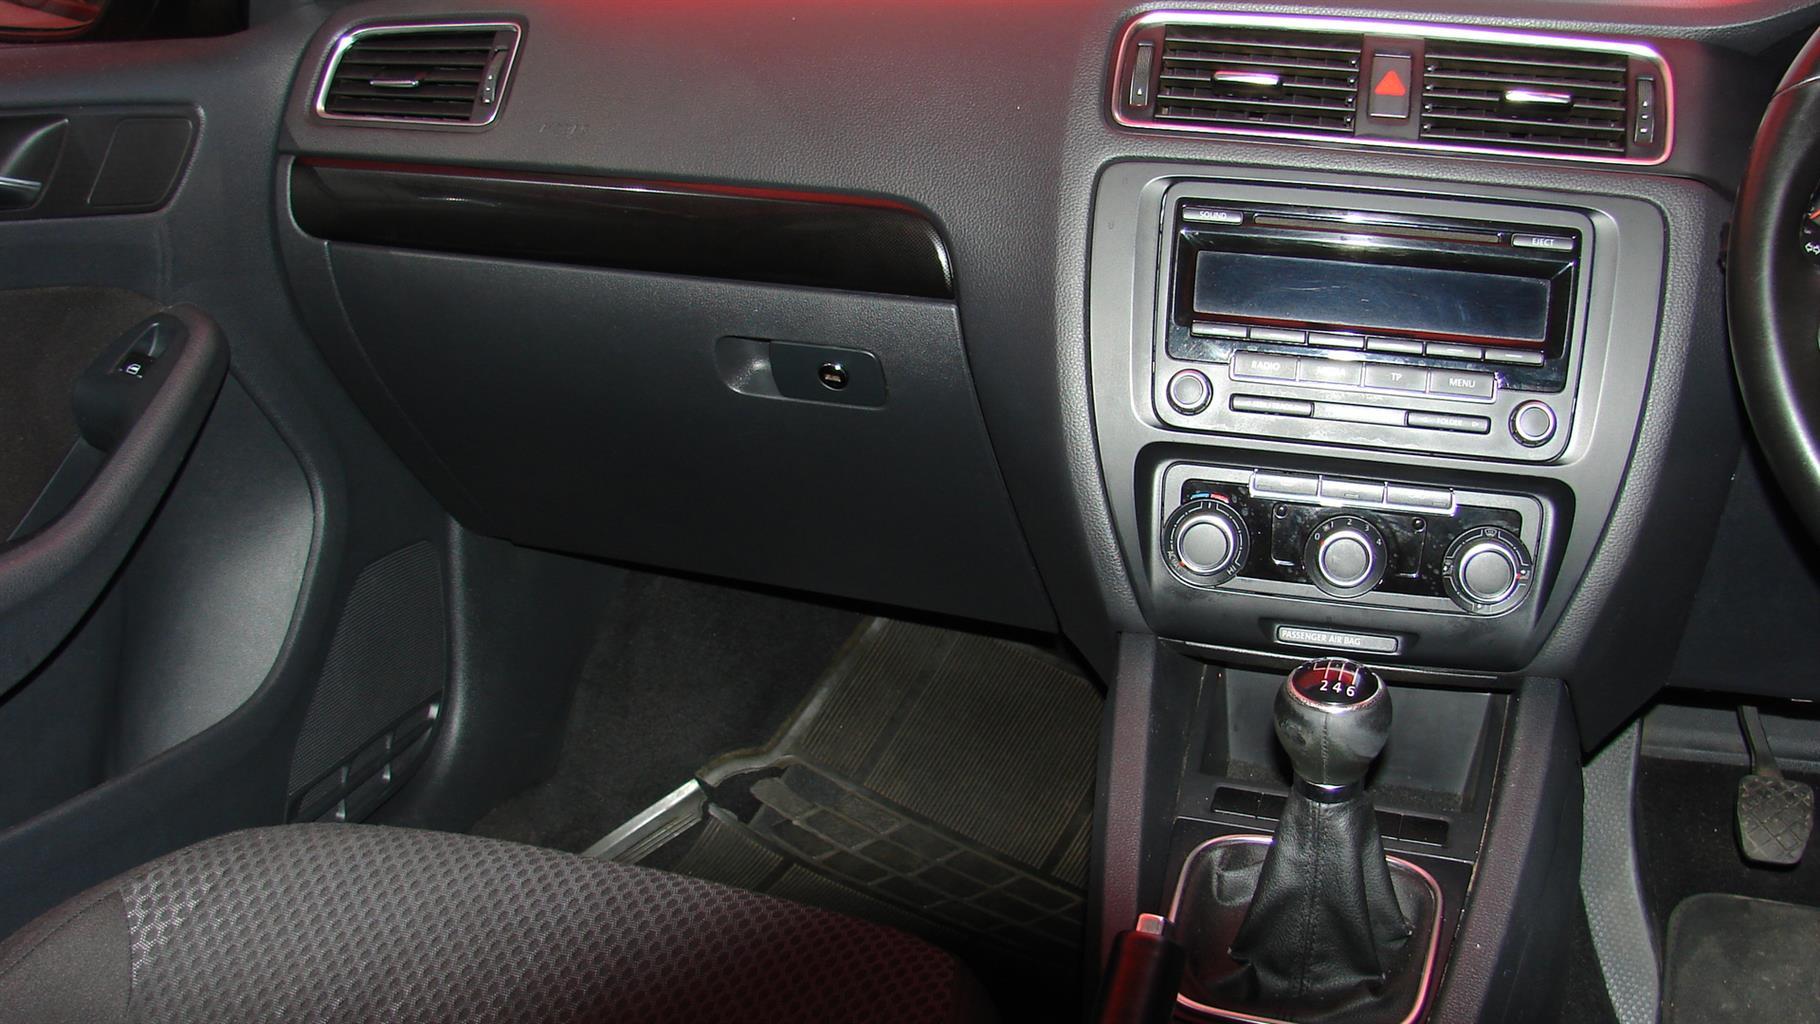 2010 Vw Jetta 14tsi Comfortline Junk Mail Volkswagen Sedan